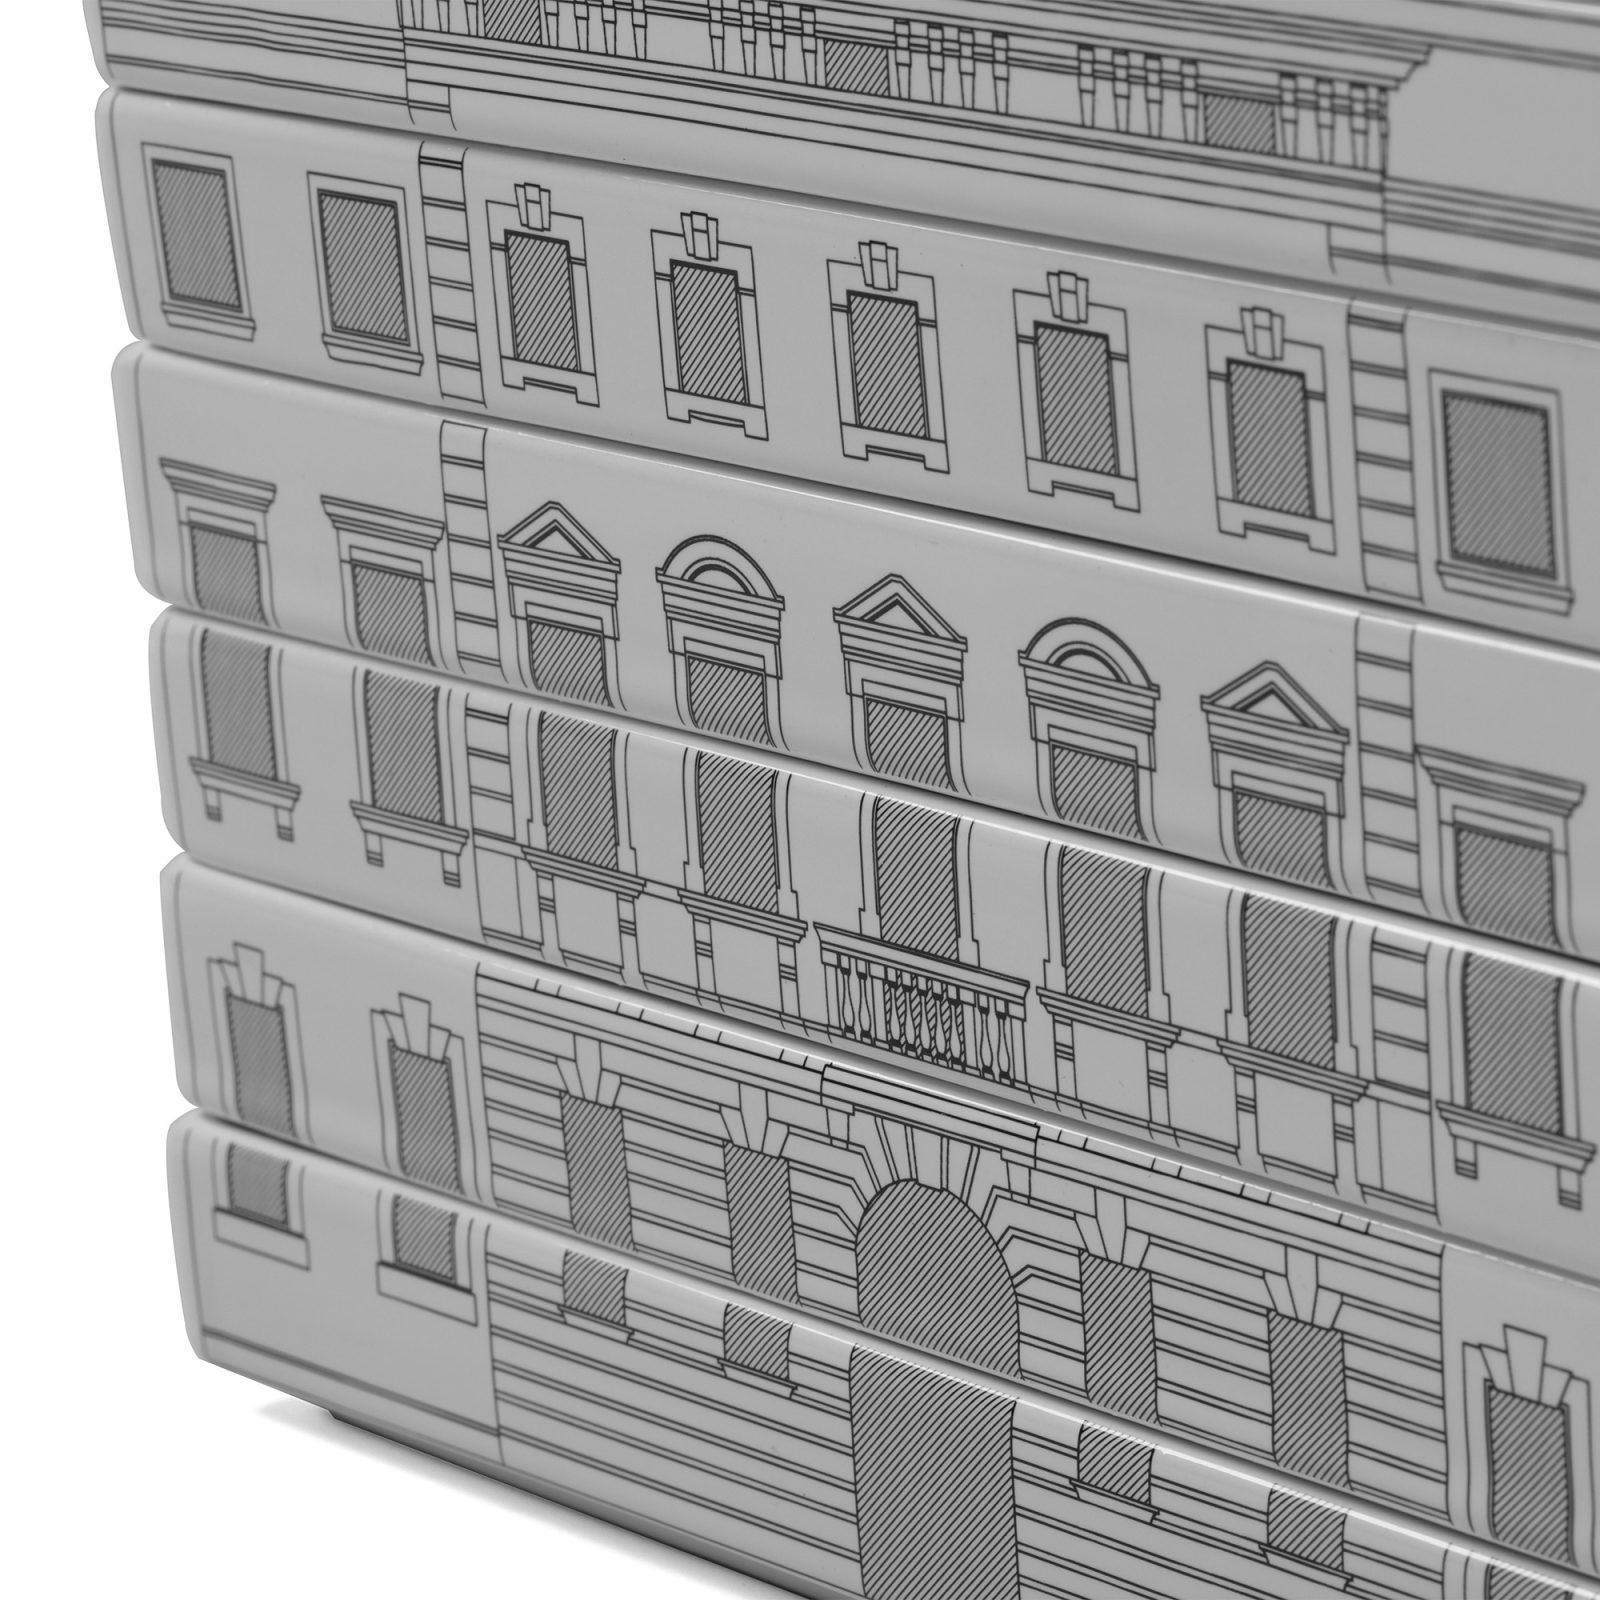 seletti-palace-collection-signoria-palace-20